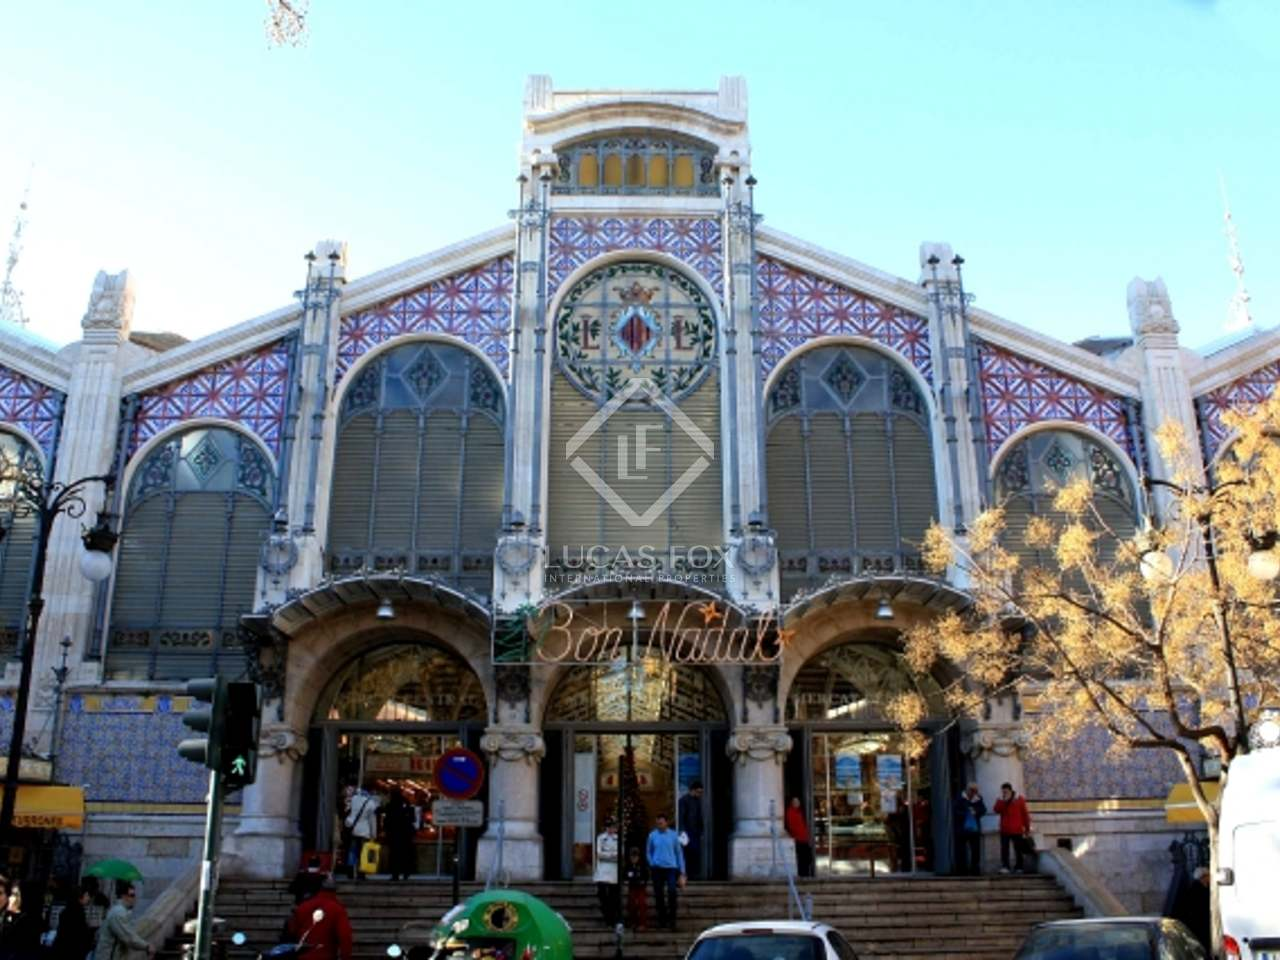 Edificio hist rico en venta en el casco antiguo de valencia for Decoradores e interioristas en valencia